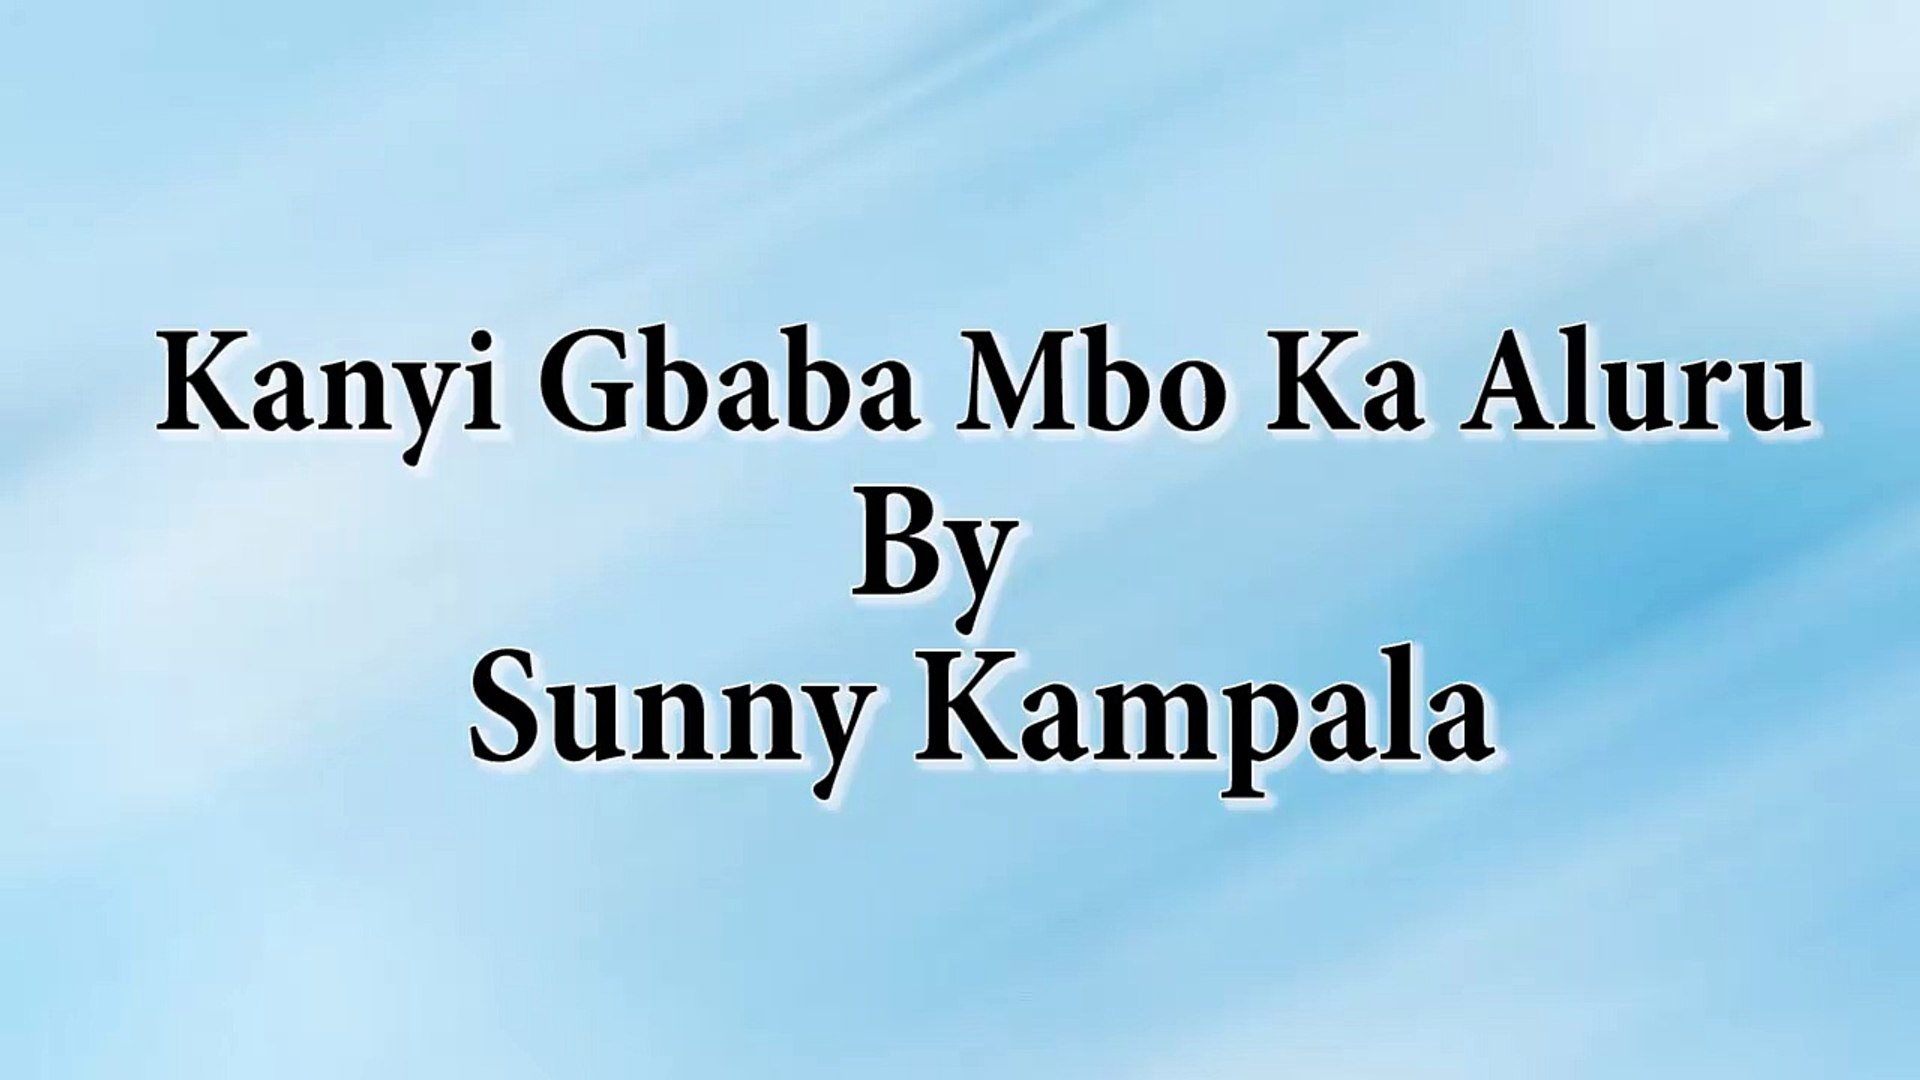 Sunny Kampala - Kanyi Gbaba Mbo Ka Aluru [Nigerian Highlife Music]